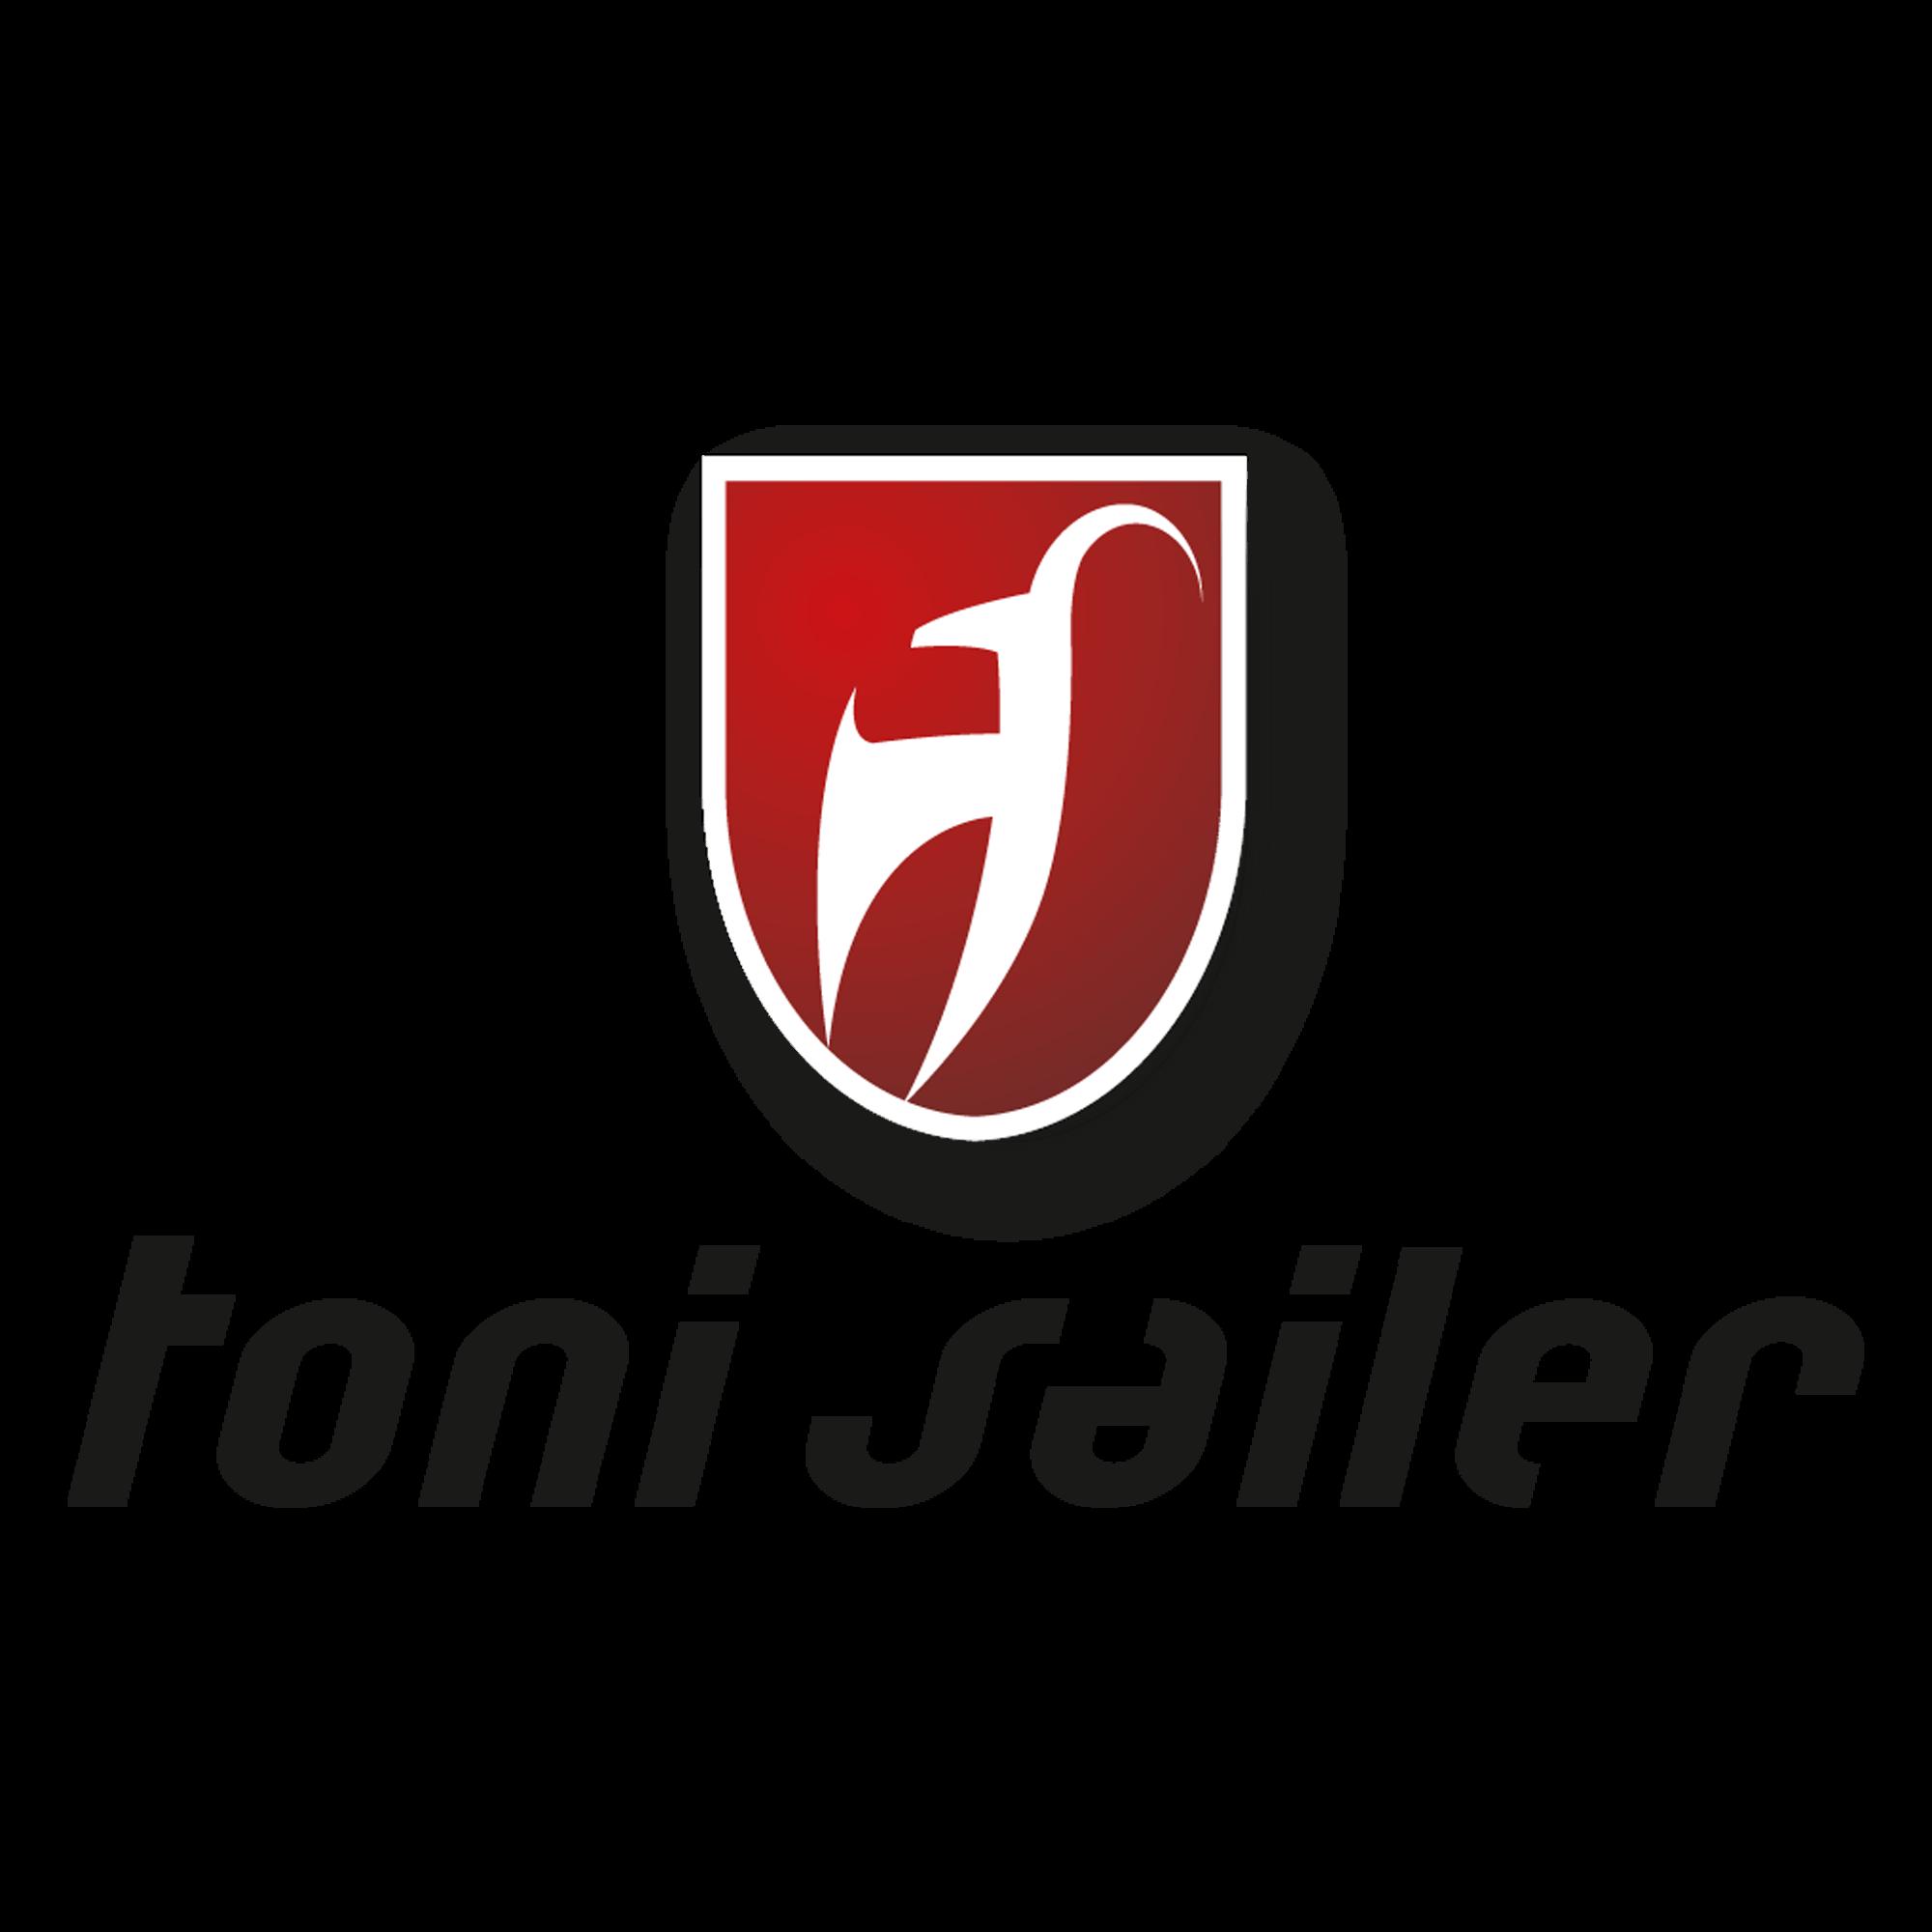 Veste de ski femme luxe Toni Sailer à Paris